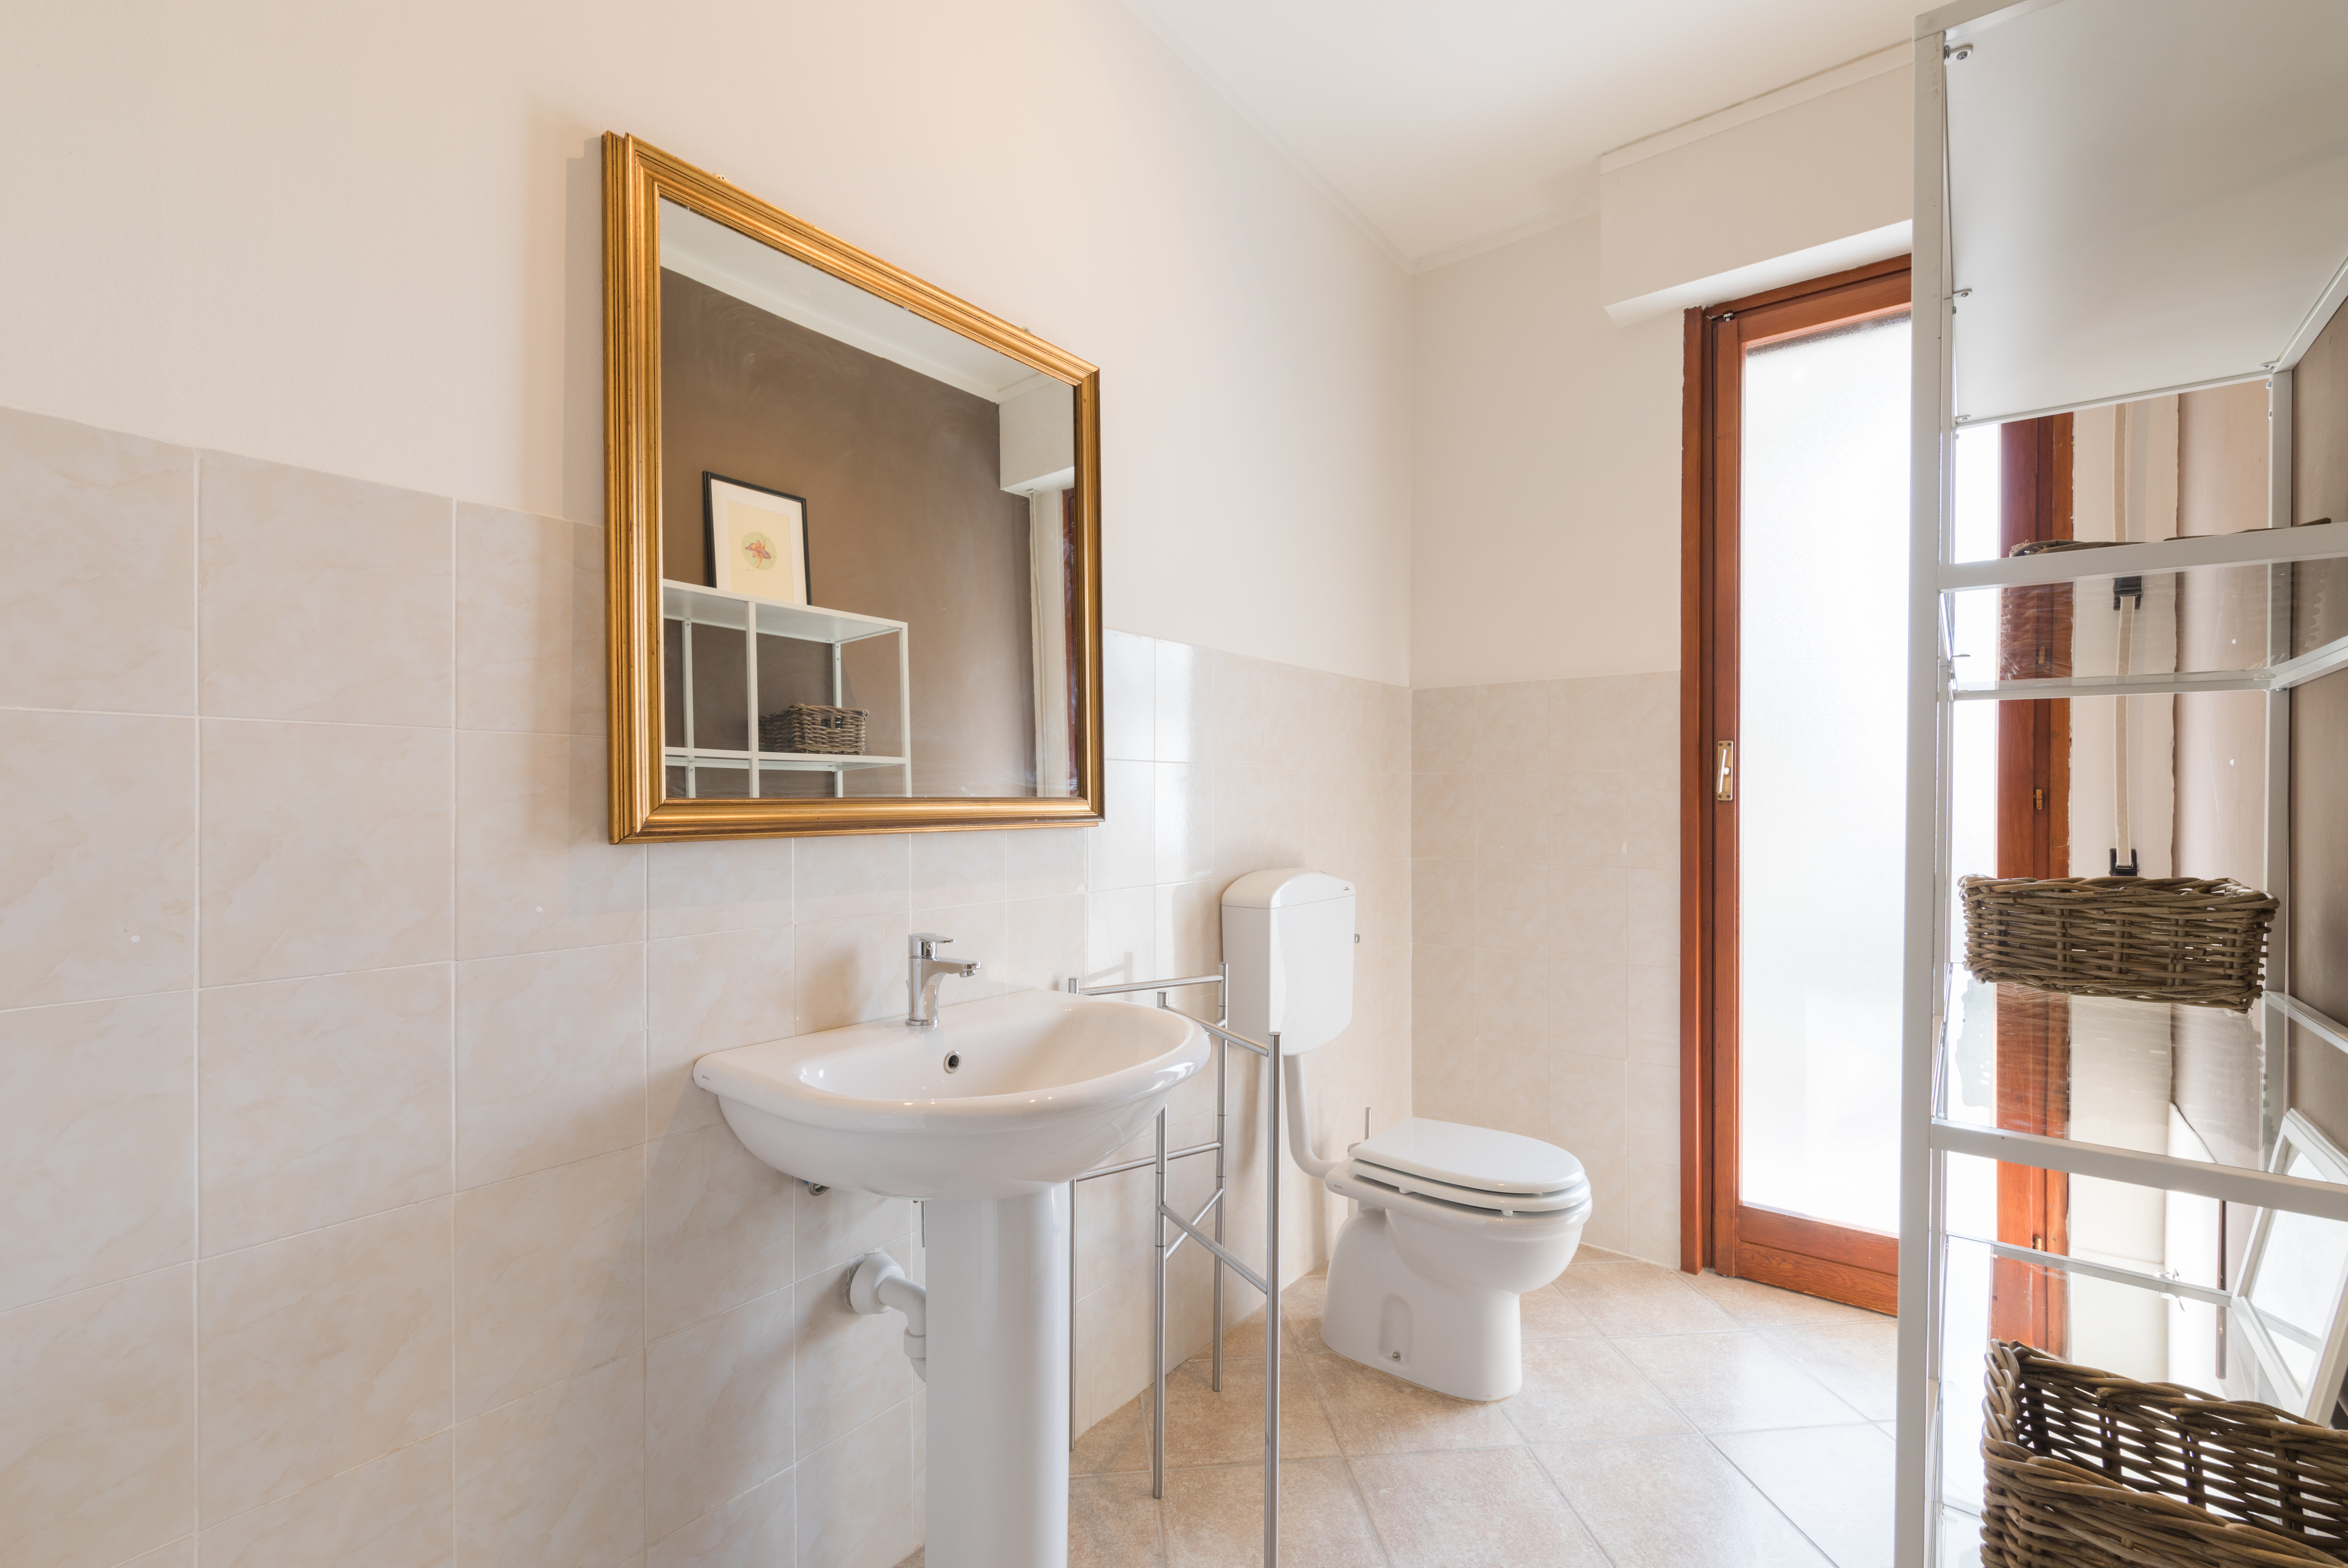 Maison Du Monde Terrazzo la maison du monde - apartments for rent in bordighera